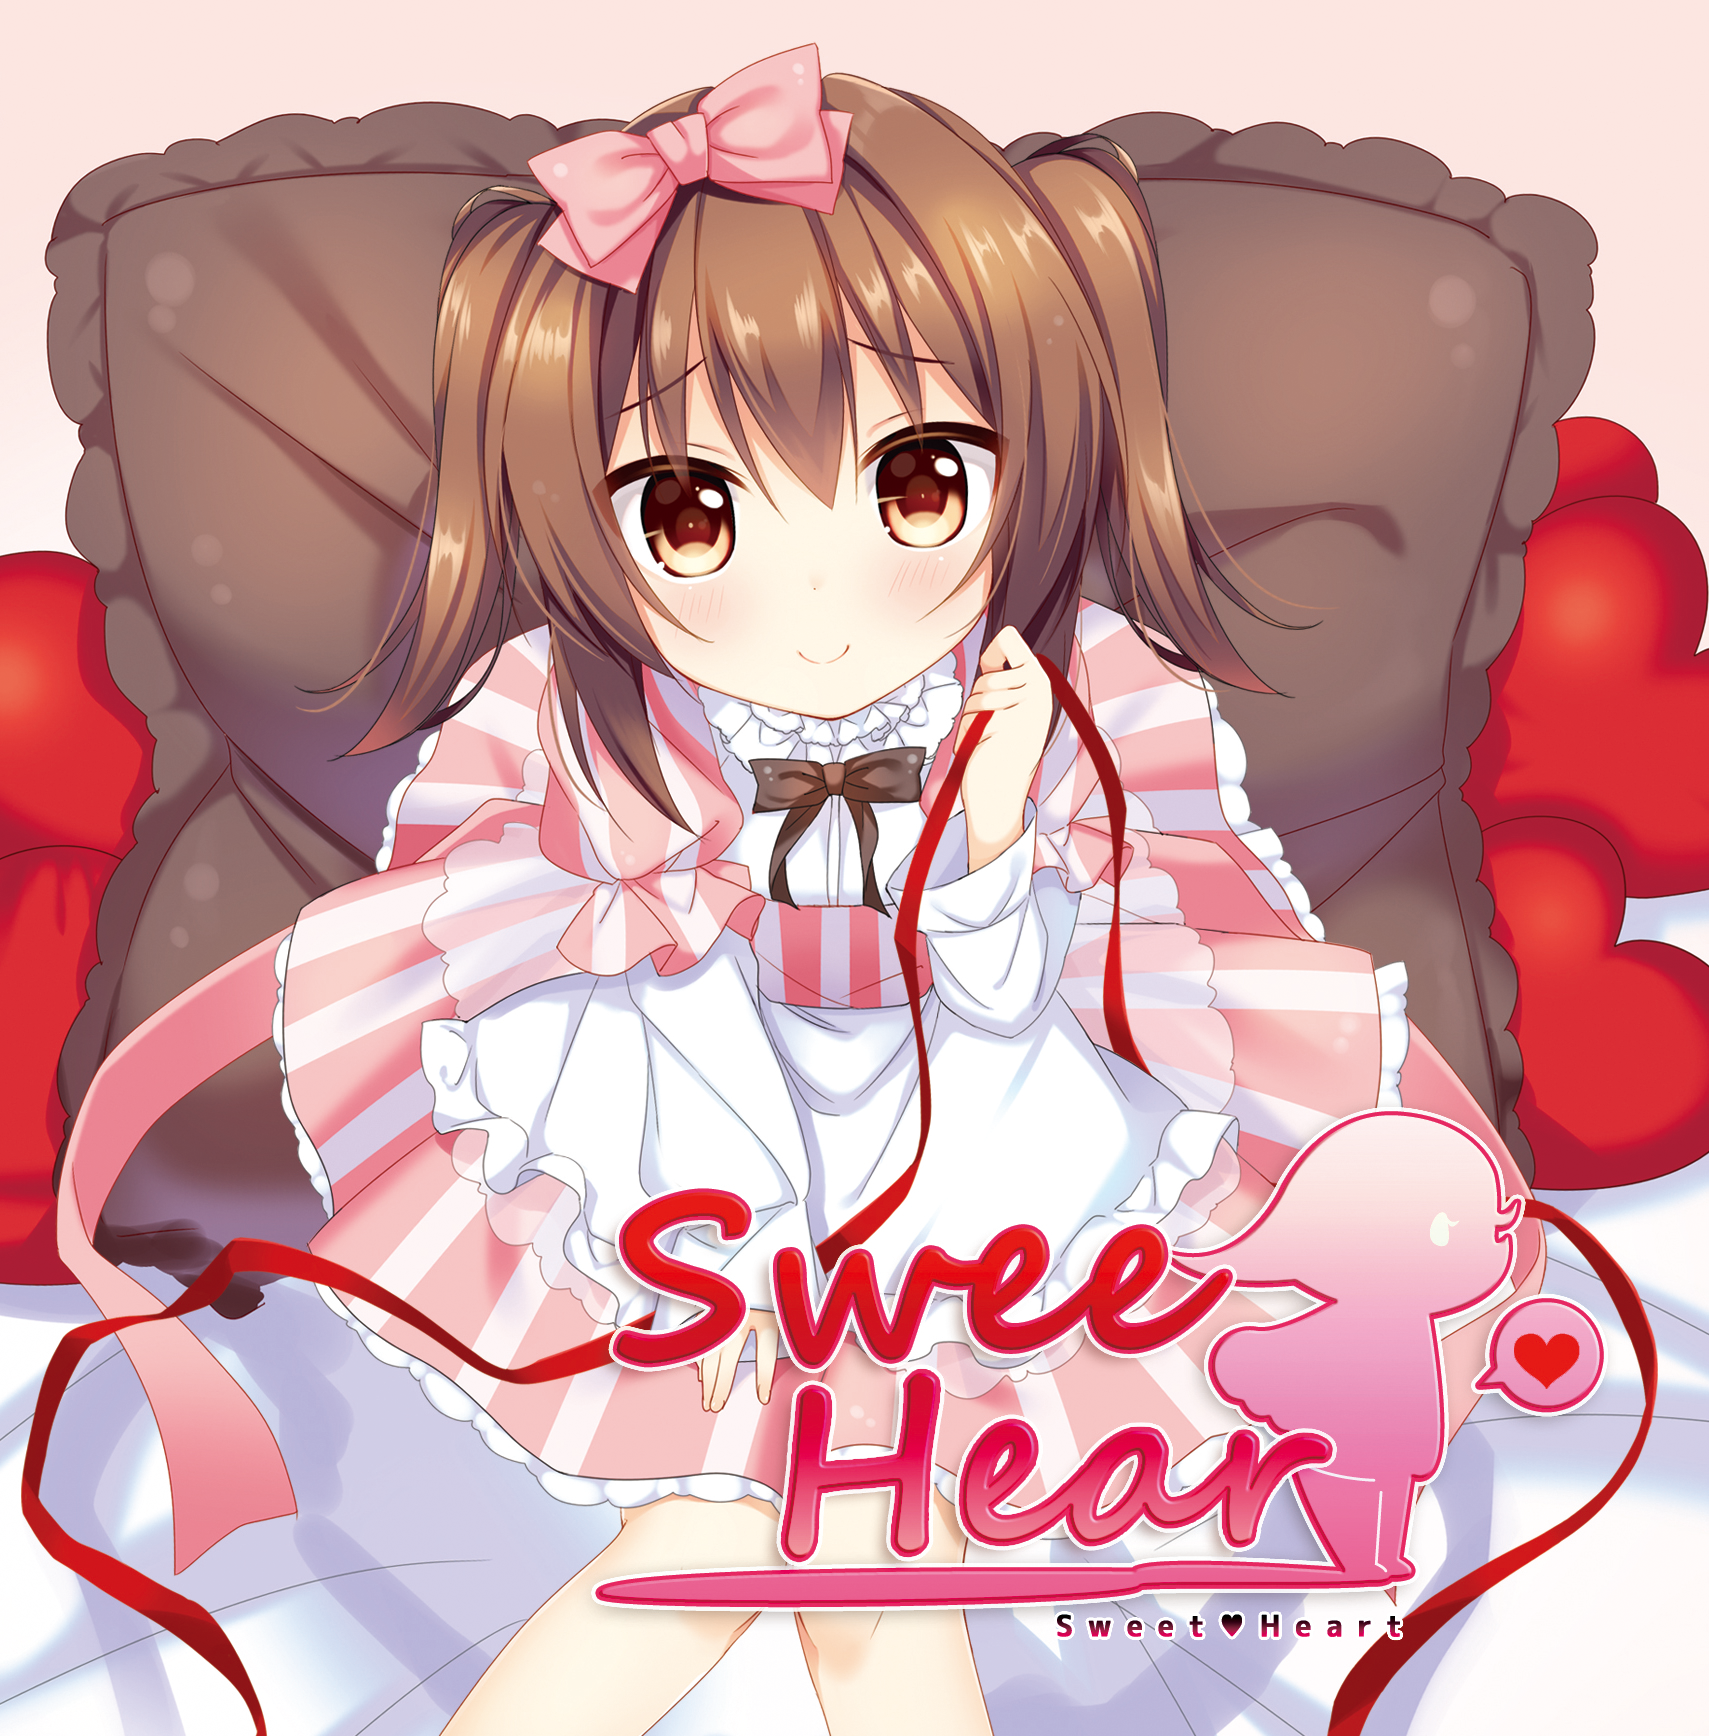 http://choko.chu.jp/sweetheart/images/SweetHeart.png